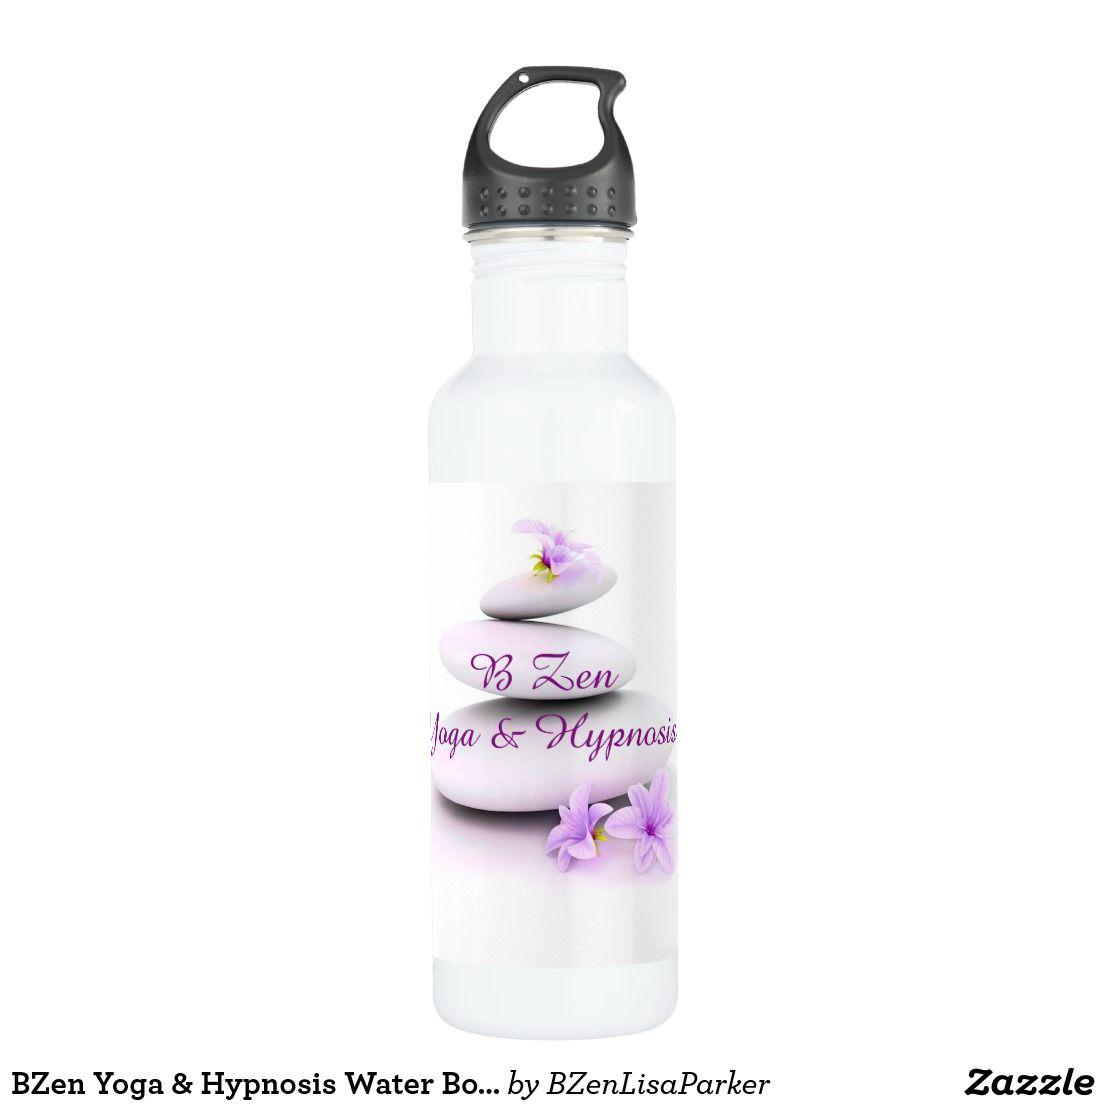 Bzen Yoga Hypnosis Water Bottle Custom Yoga Water Bottles